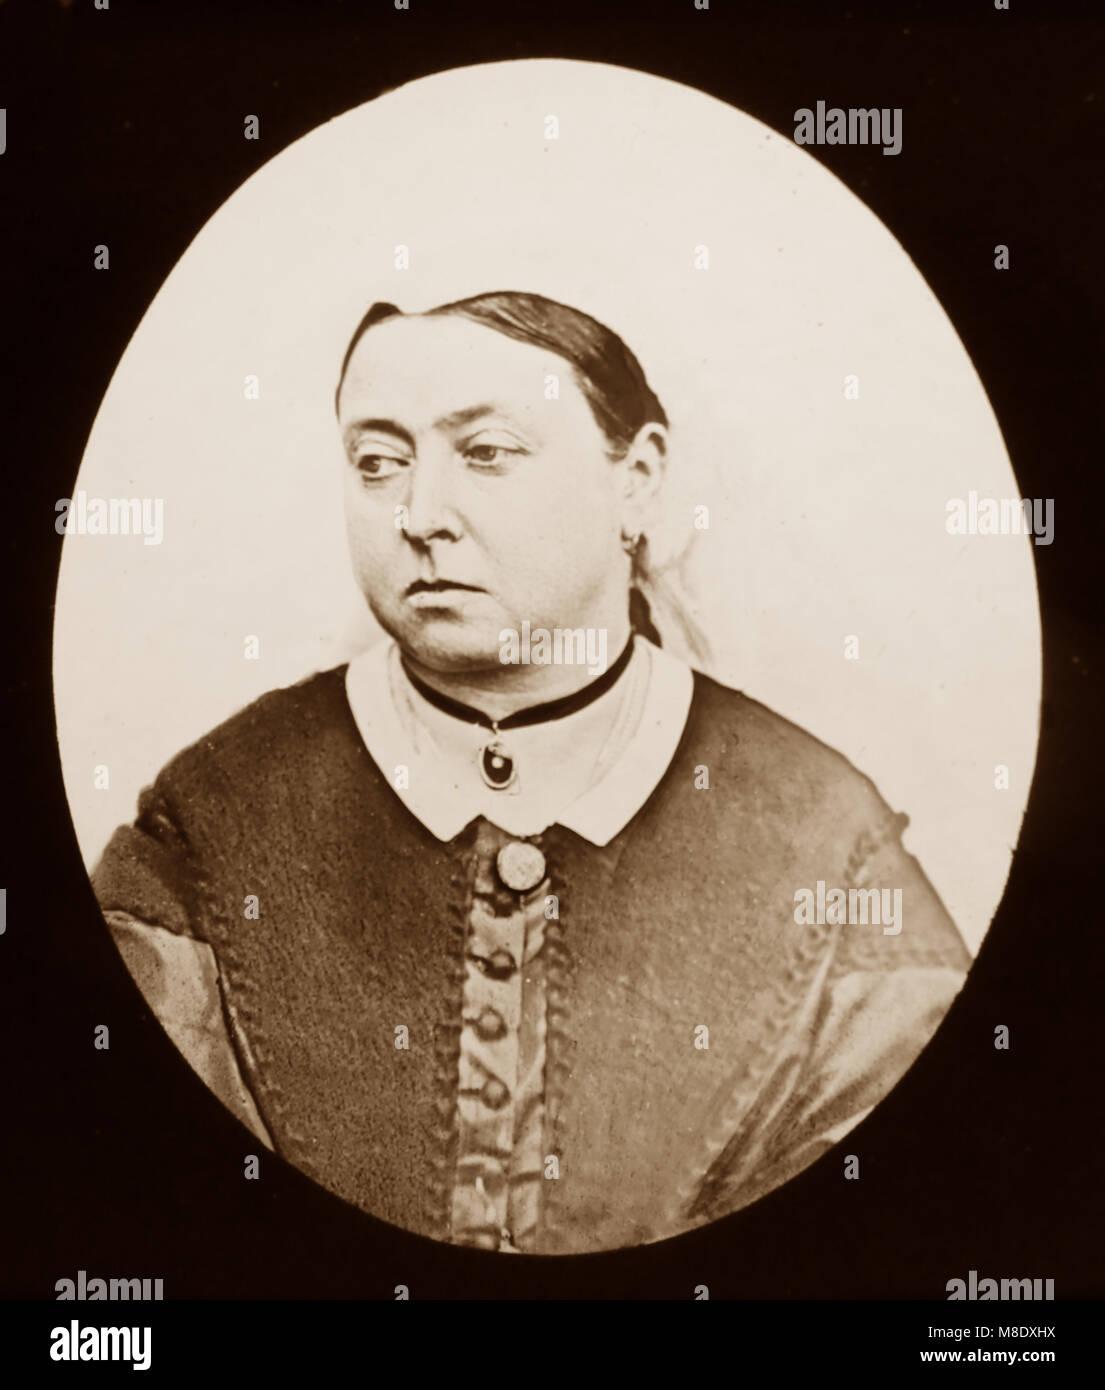 Queen Victoria, Victorian period - Stock Image